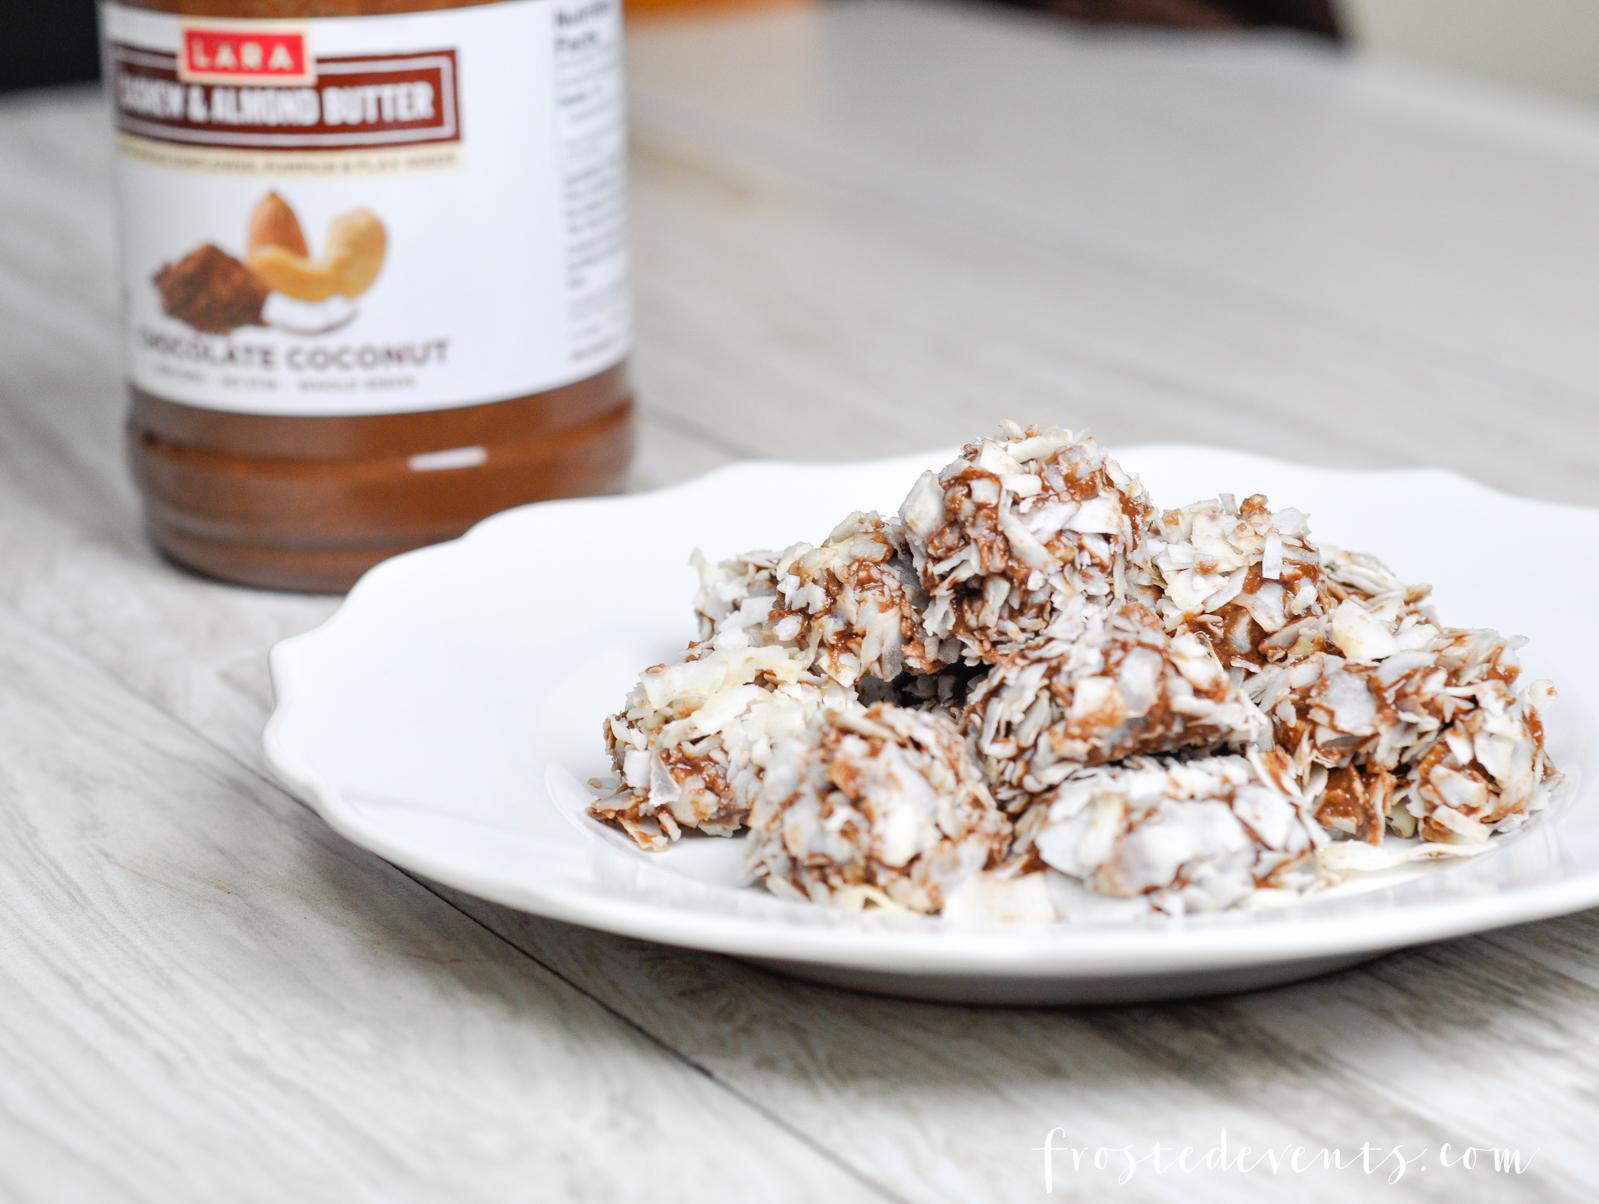 Chocolate Nut Butter Truffles Recipe with LARA Nut Butter frostedevents.com @frostedevents Dessert Recipes Snacks and Treats